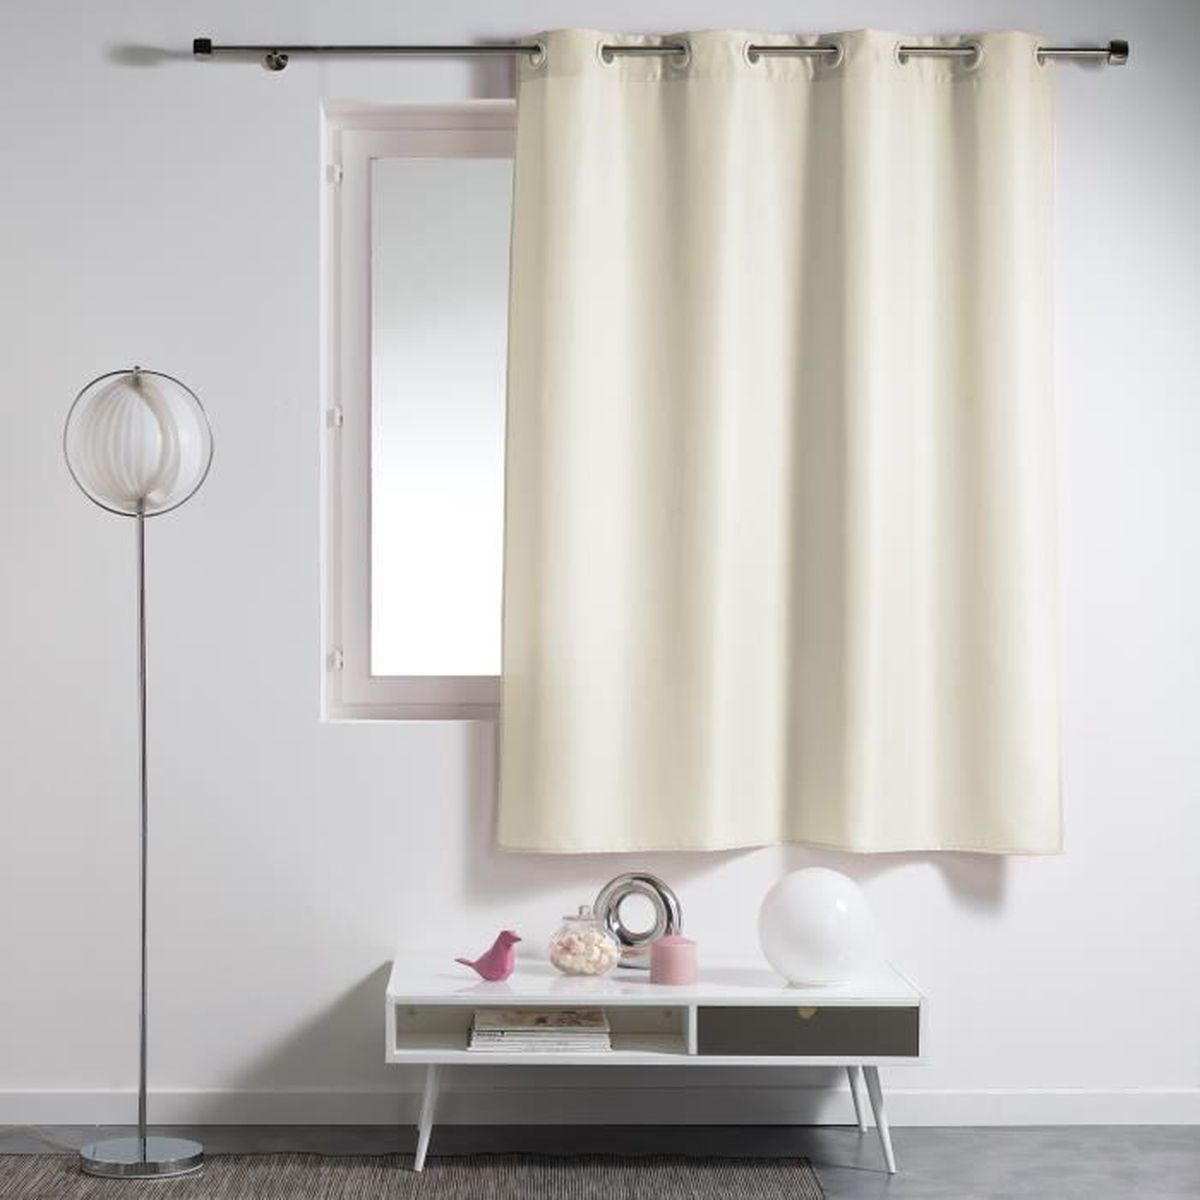 rideau oeillets 140x180 essentiel naturel achat vente rideau cdiscount. Black Bedroom Furniture Sets. Home Design Ideas